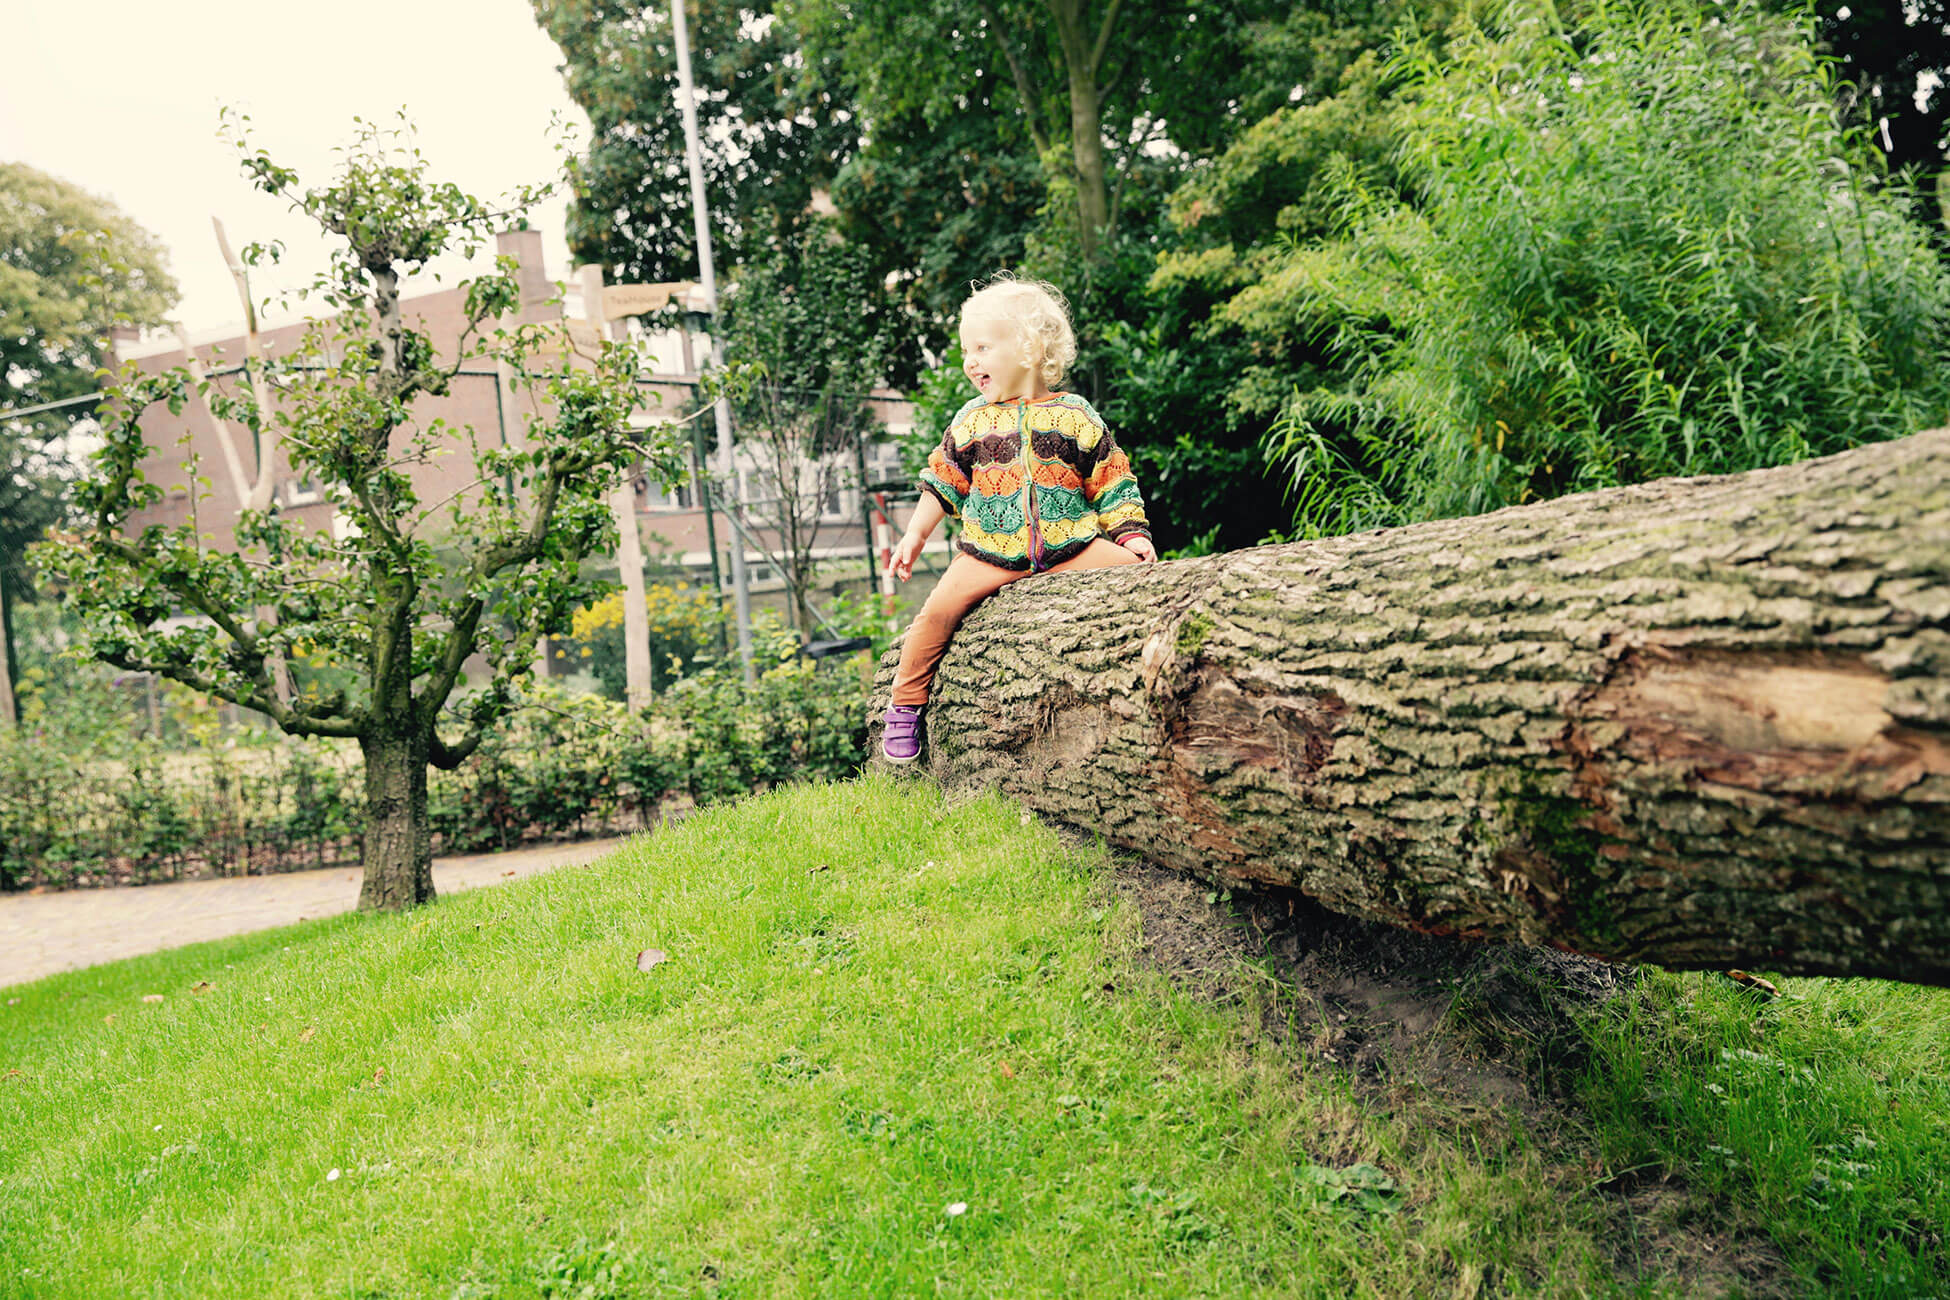 boomstam natuurspeeltuin